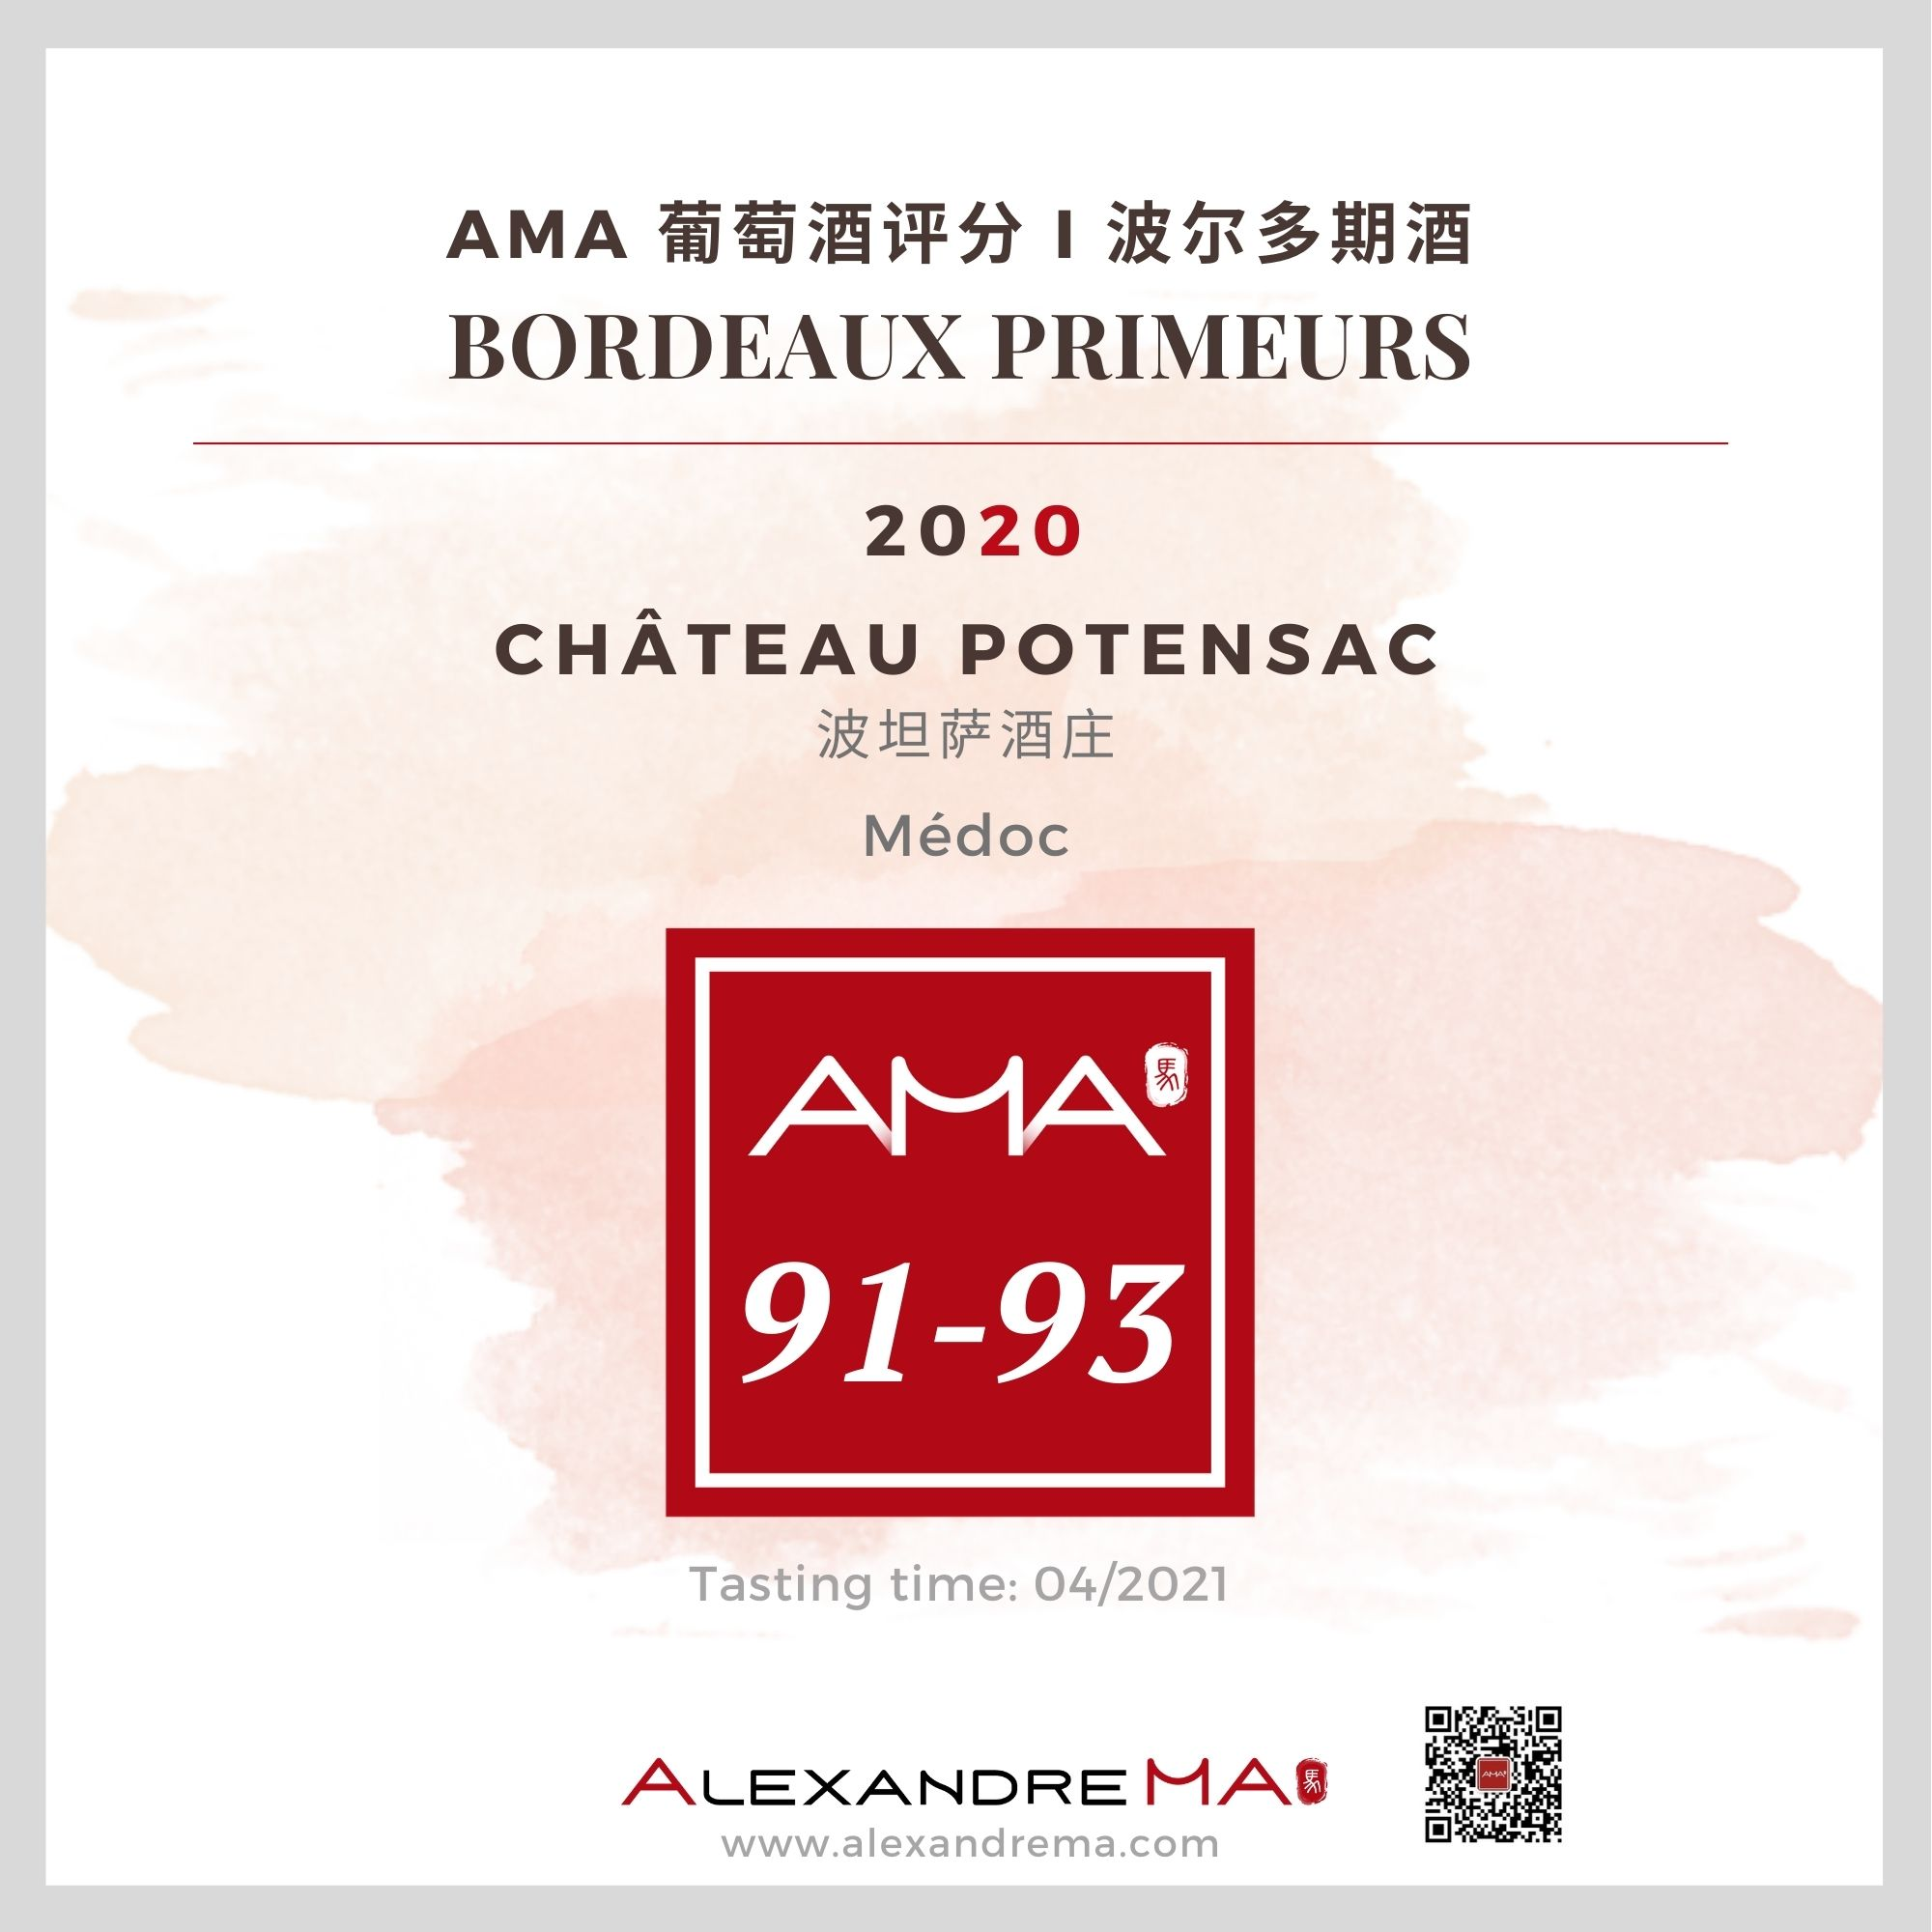 Château Potensac 2020 波坦萨酒庄 - Alexandre Ma